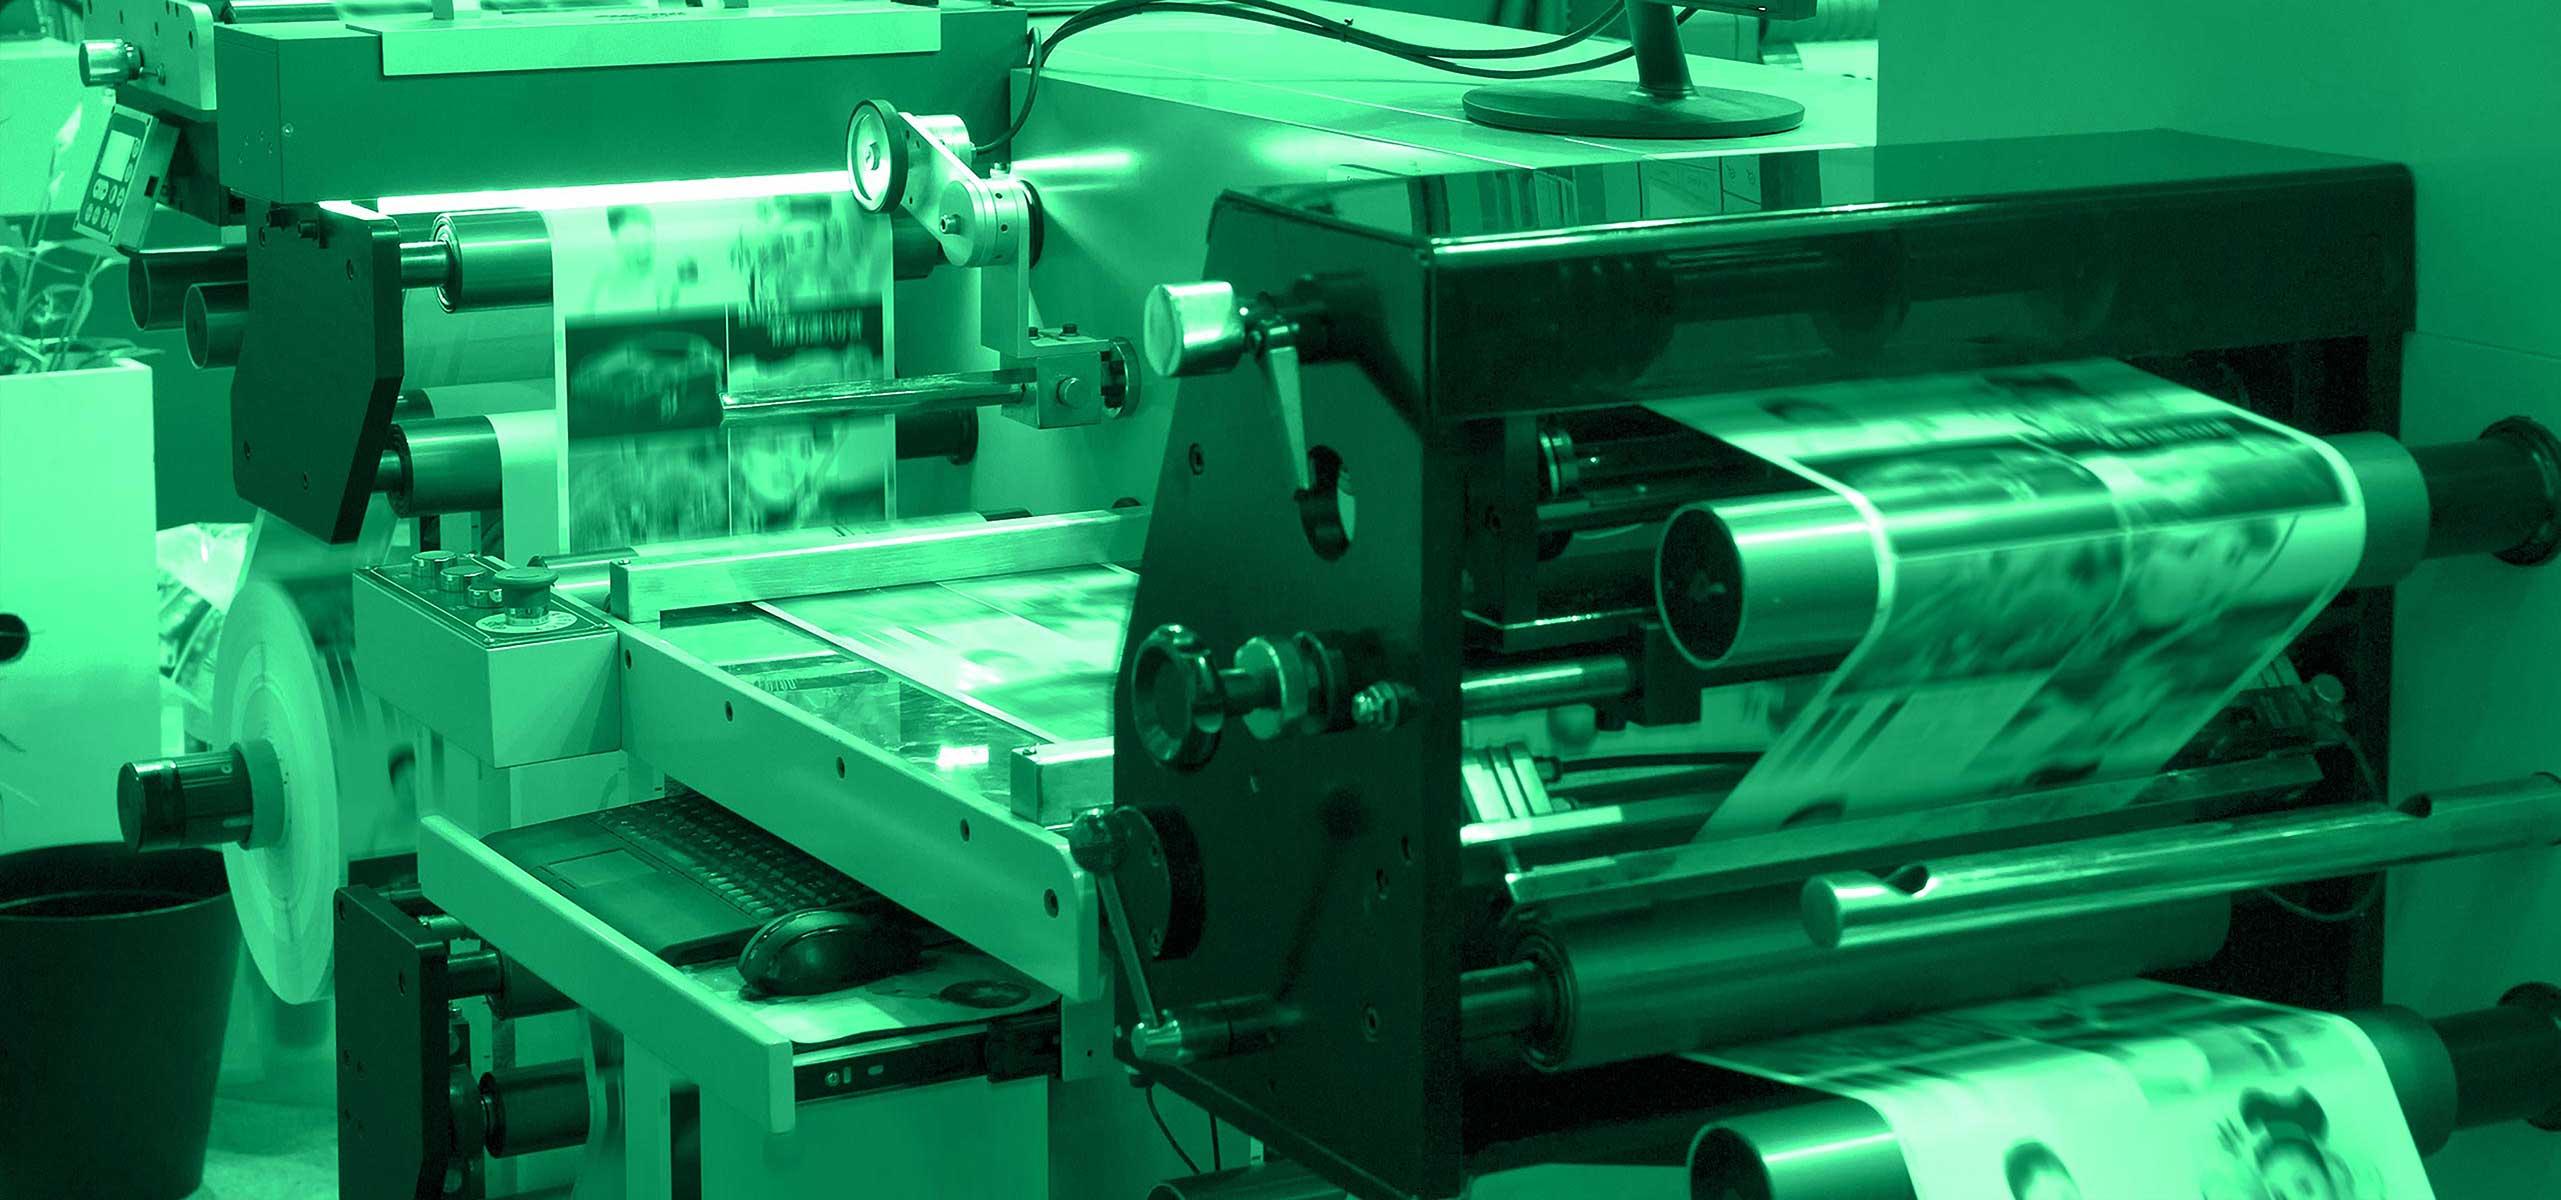 Printing press running a job